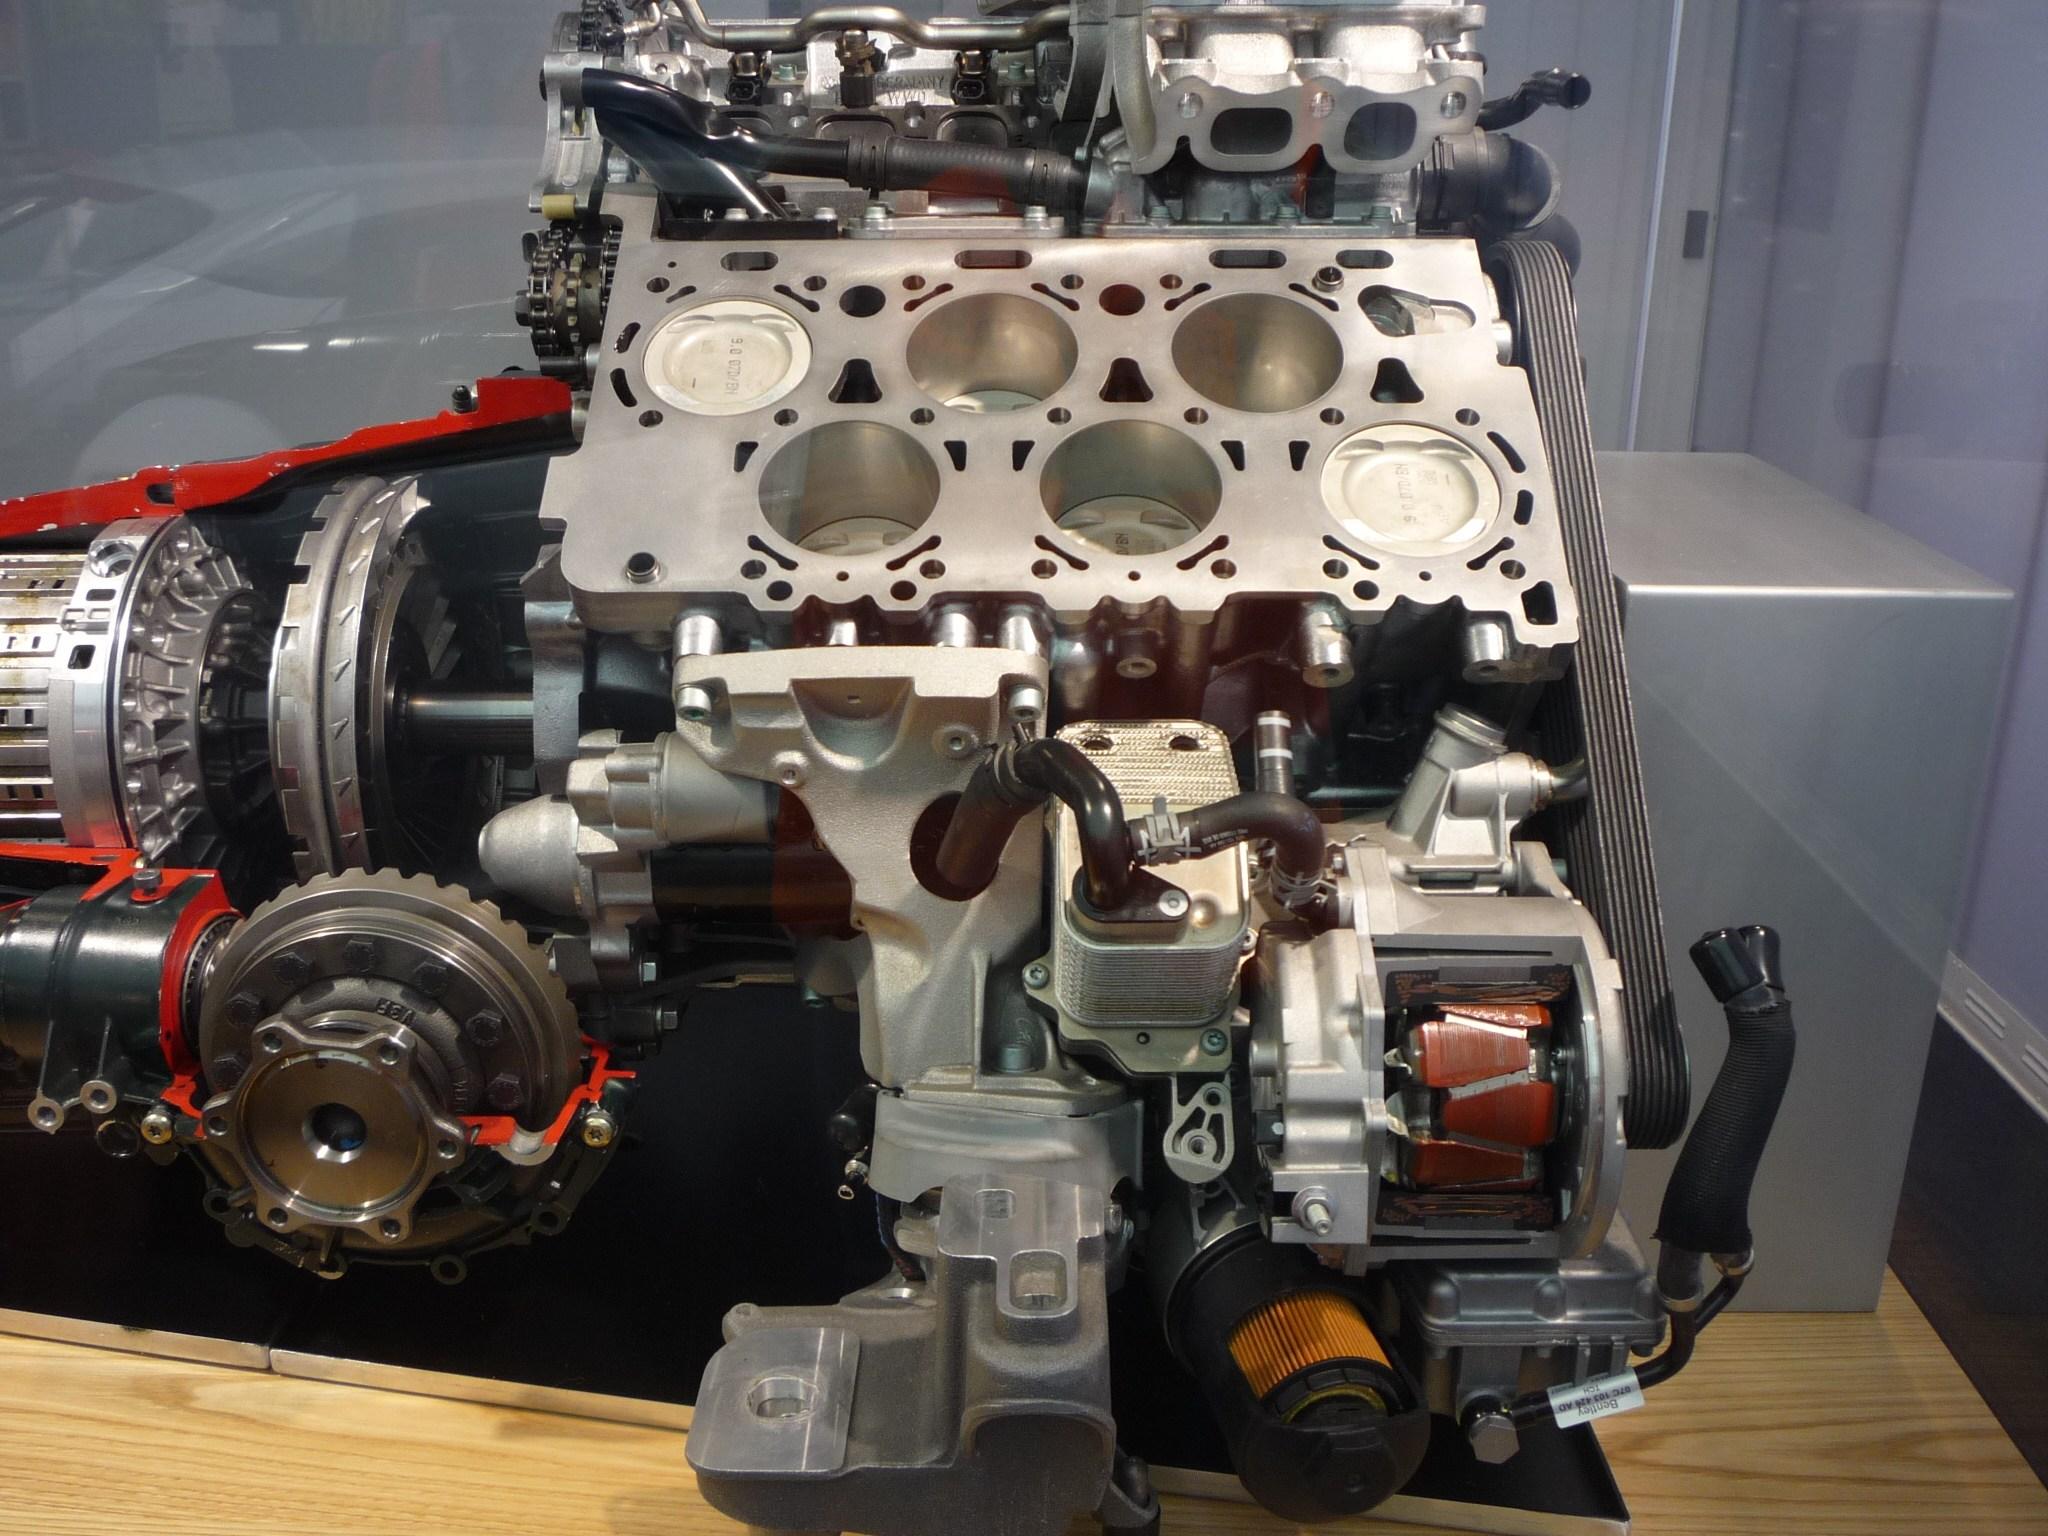 vg_8121] w12 engine animation diagram w12 free engine image for ... audi w12 engine diagram w12 phaeton animo bemua mohammedshrine librar wiring 101